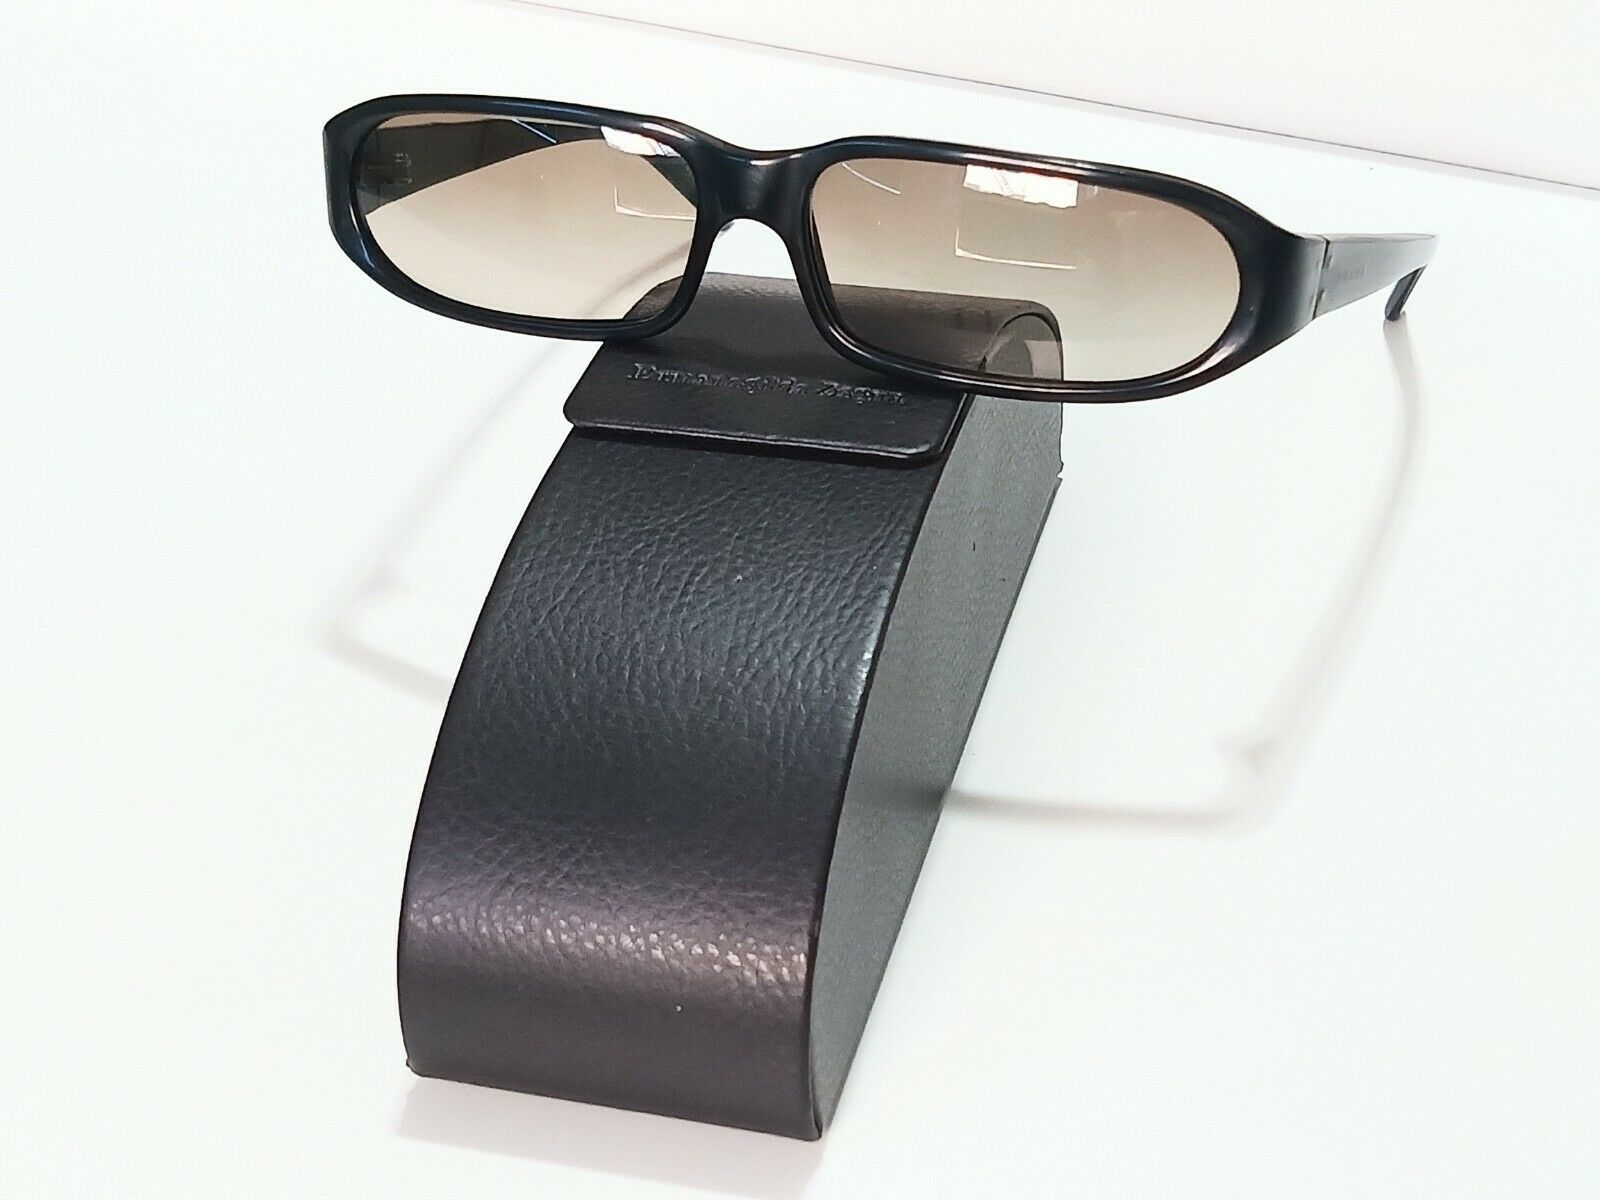 VTG Prada Sunglasses 90s Black Unisex - image 1